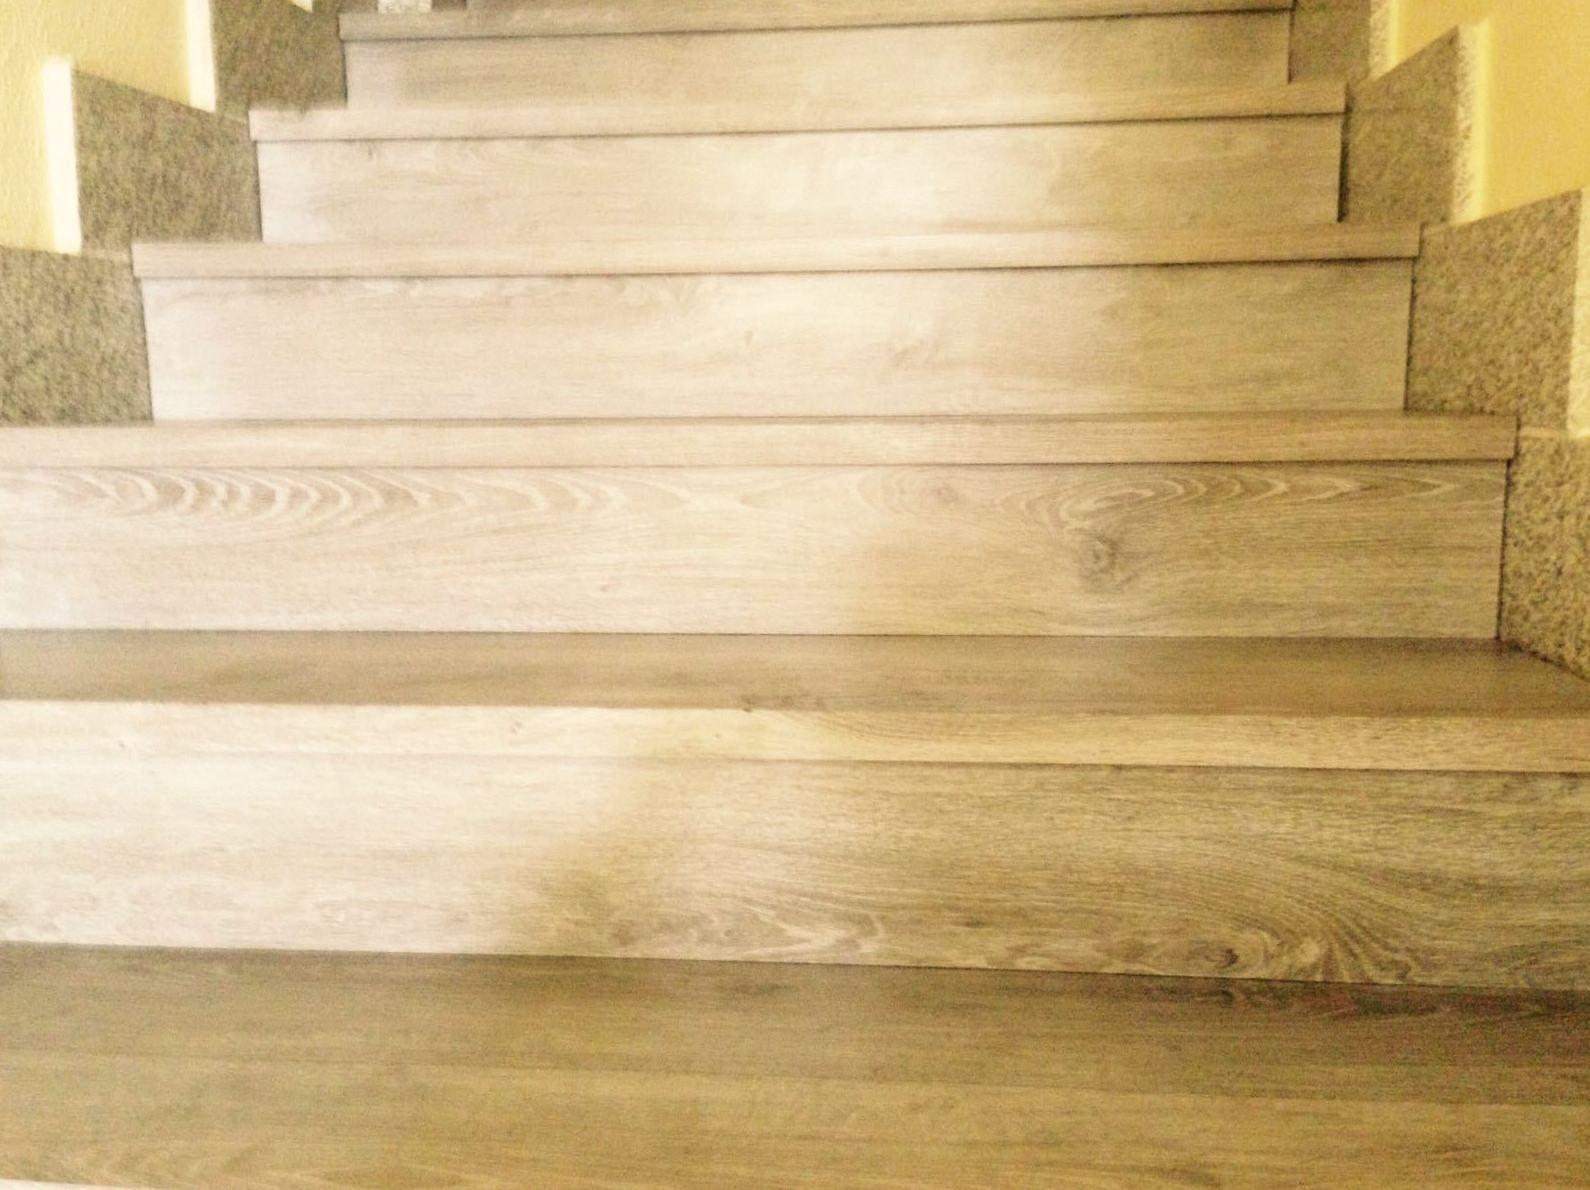 Escaleras con vinilo,woodmagik